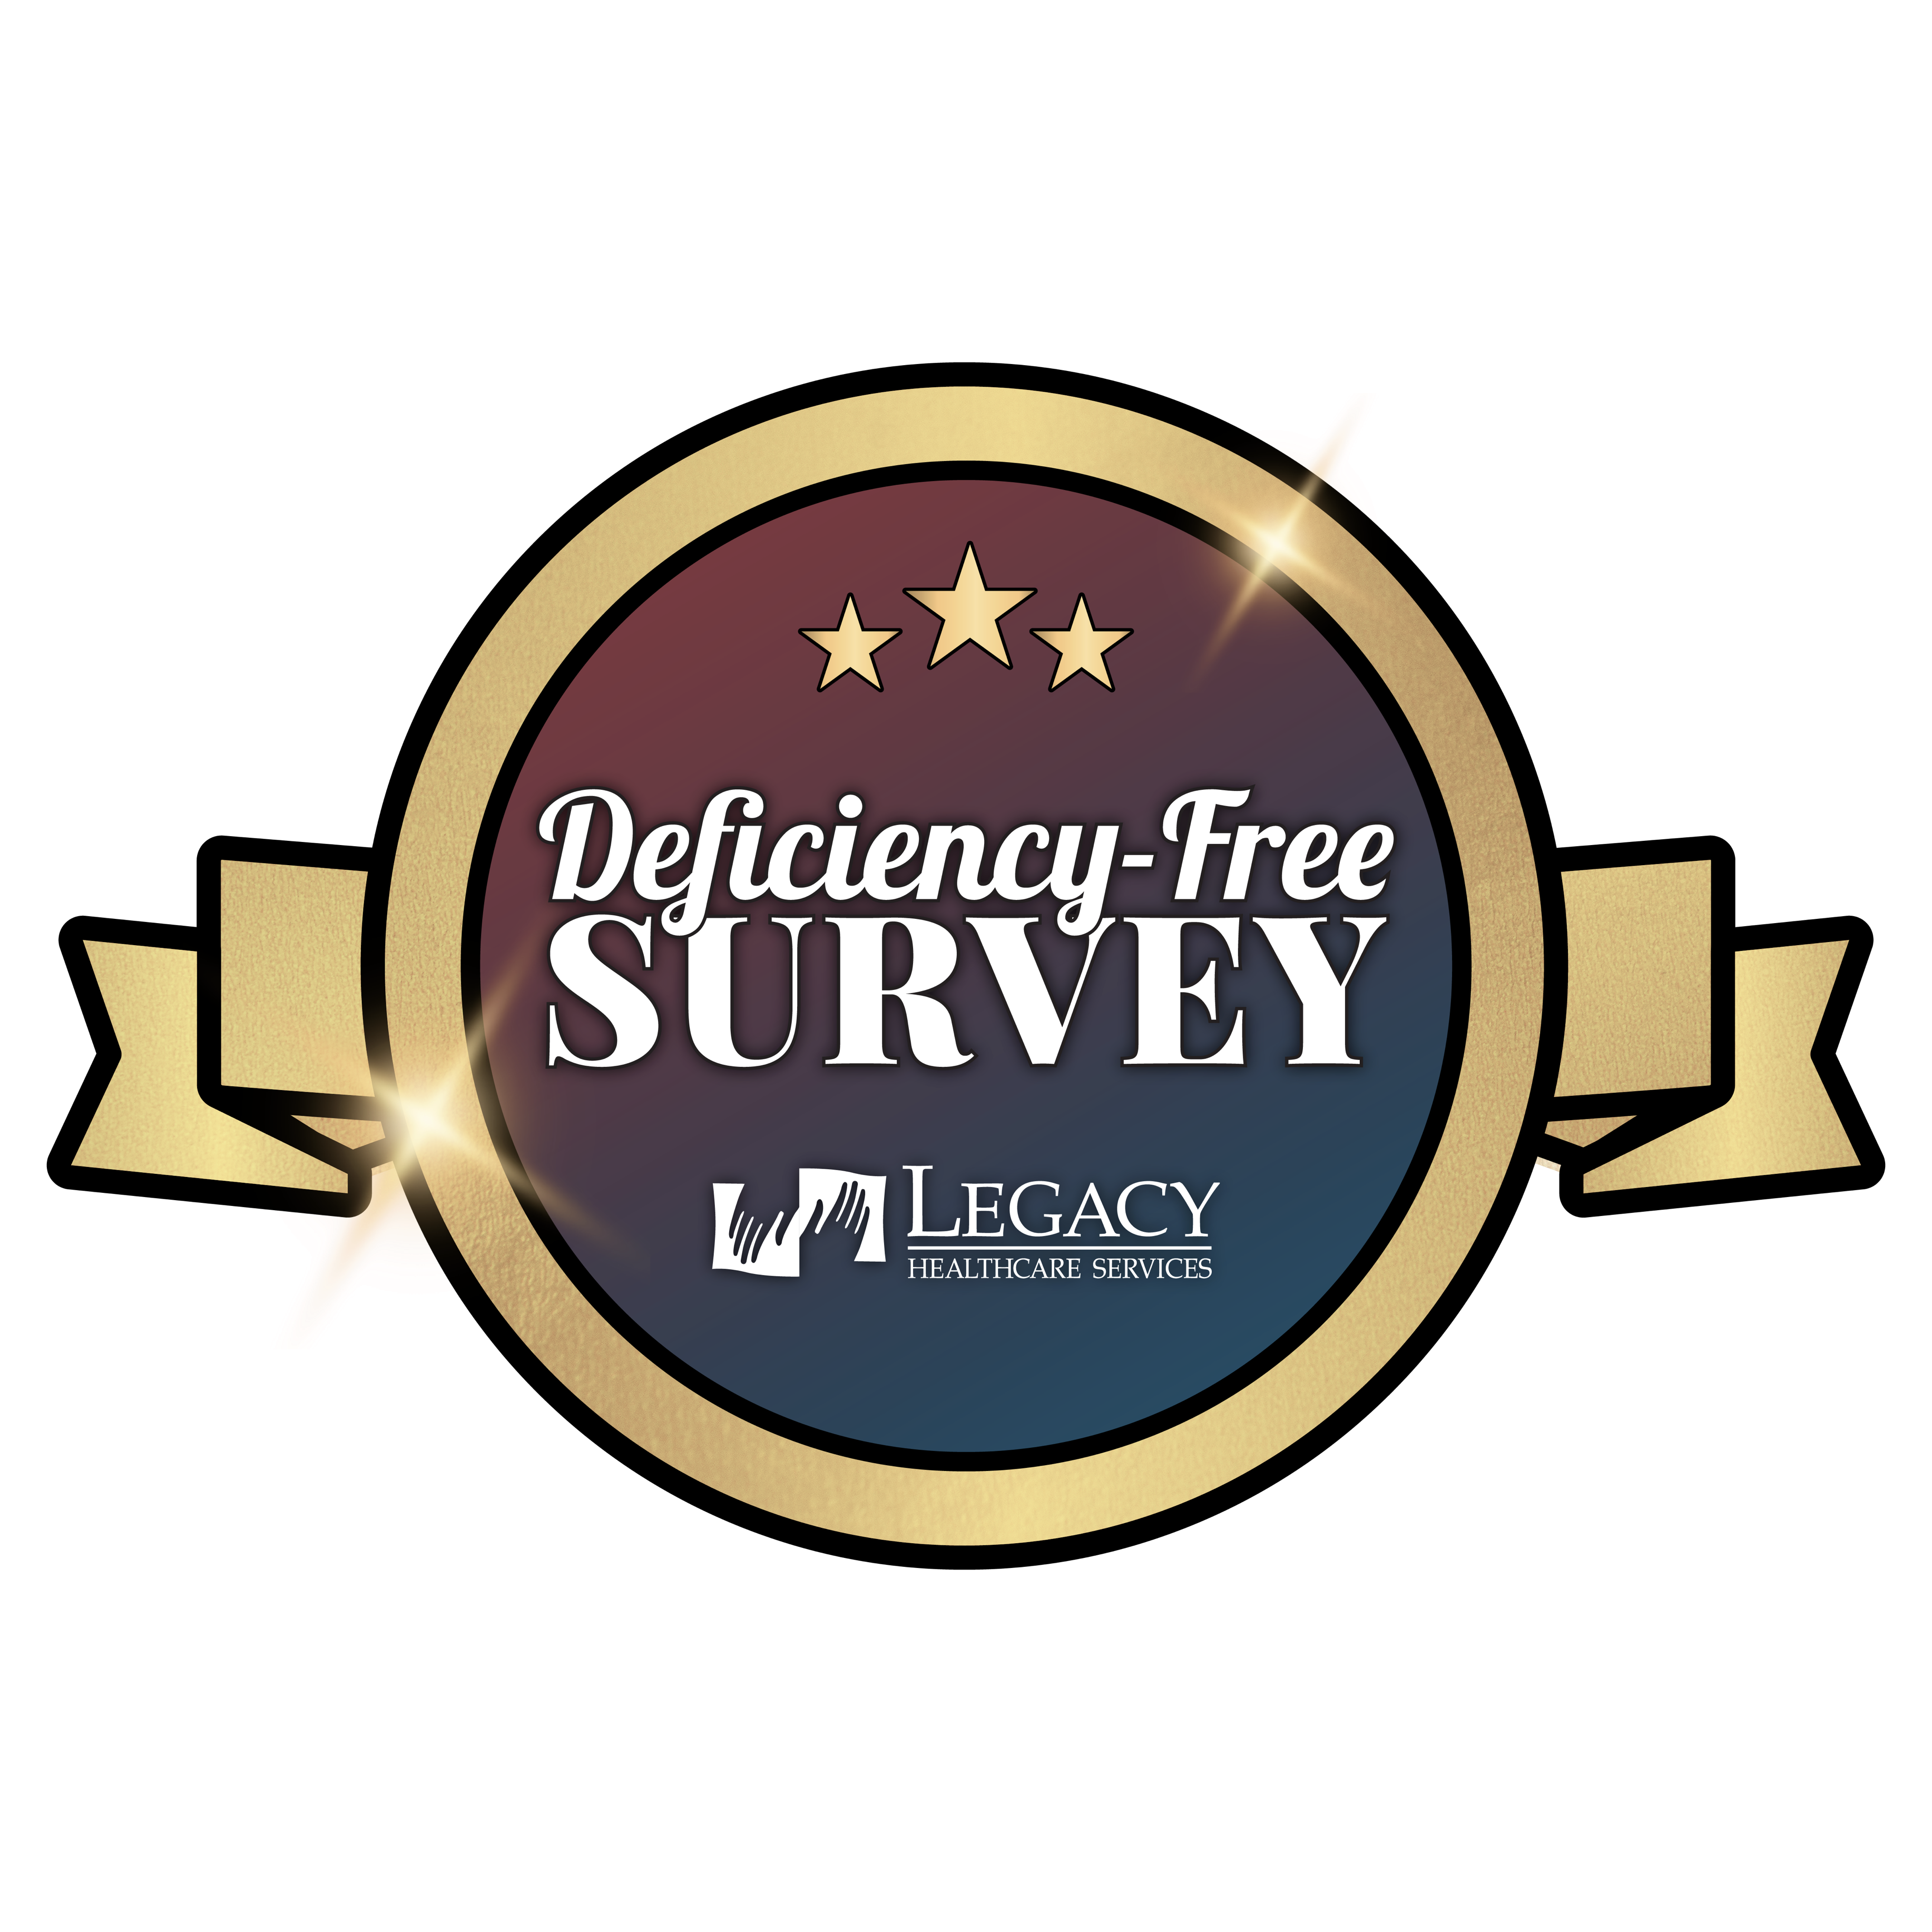 Deficiency-Free Survey Award